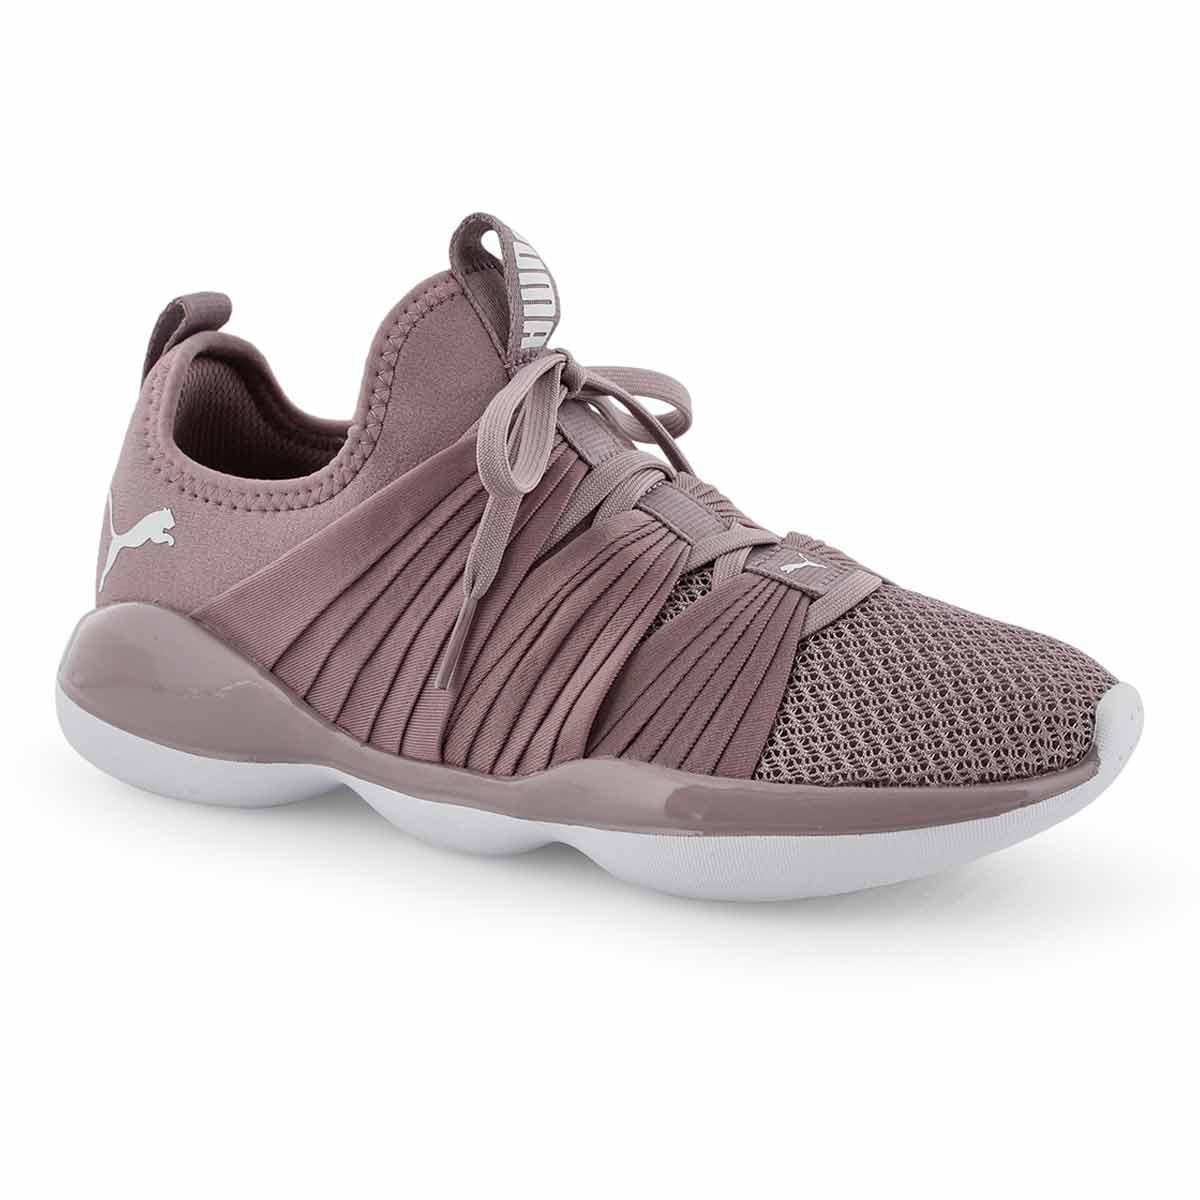 Lds Flourish elderberry slip on sneaker